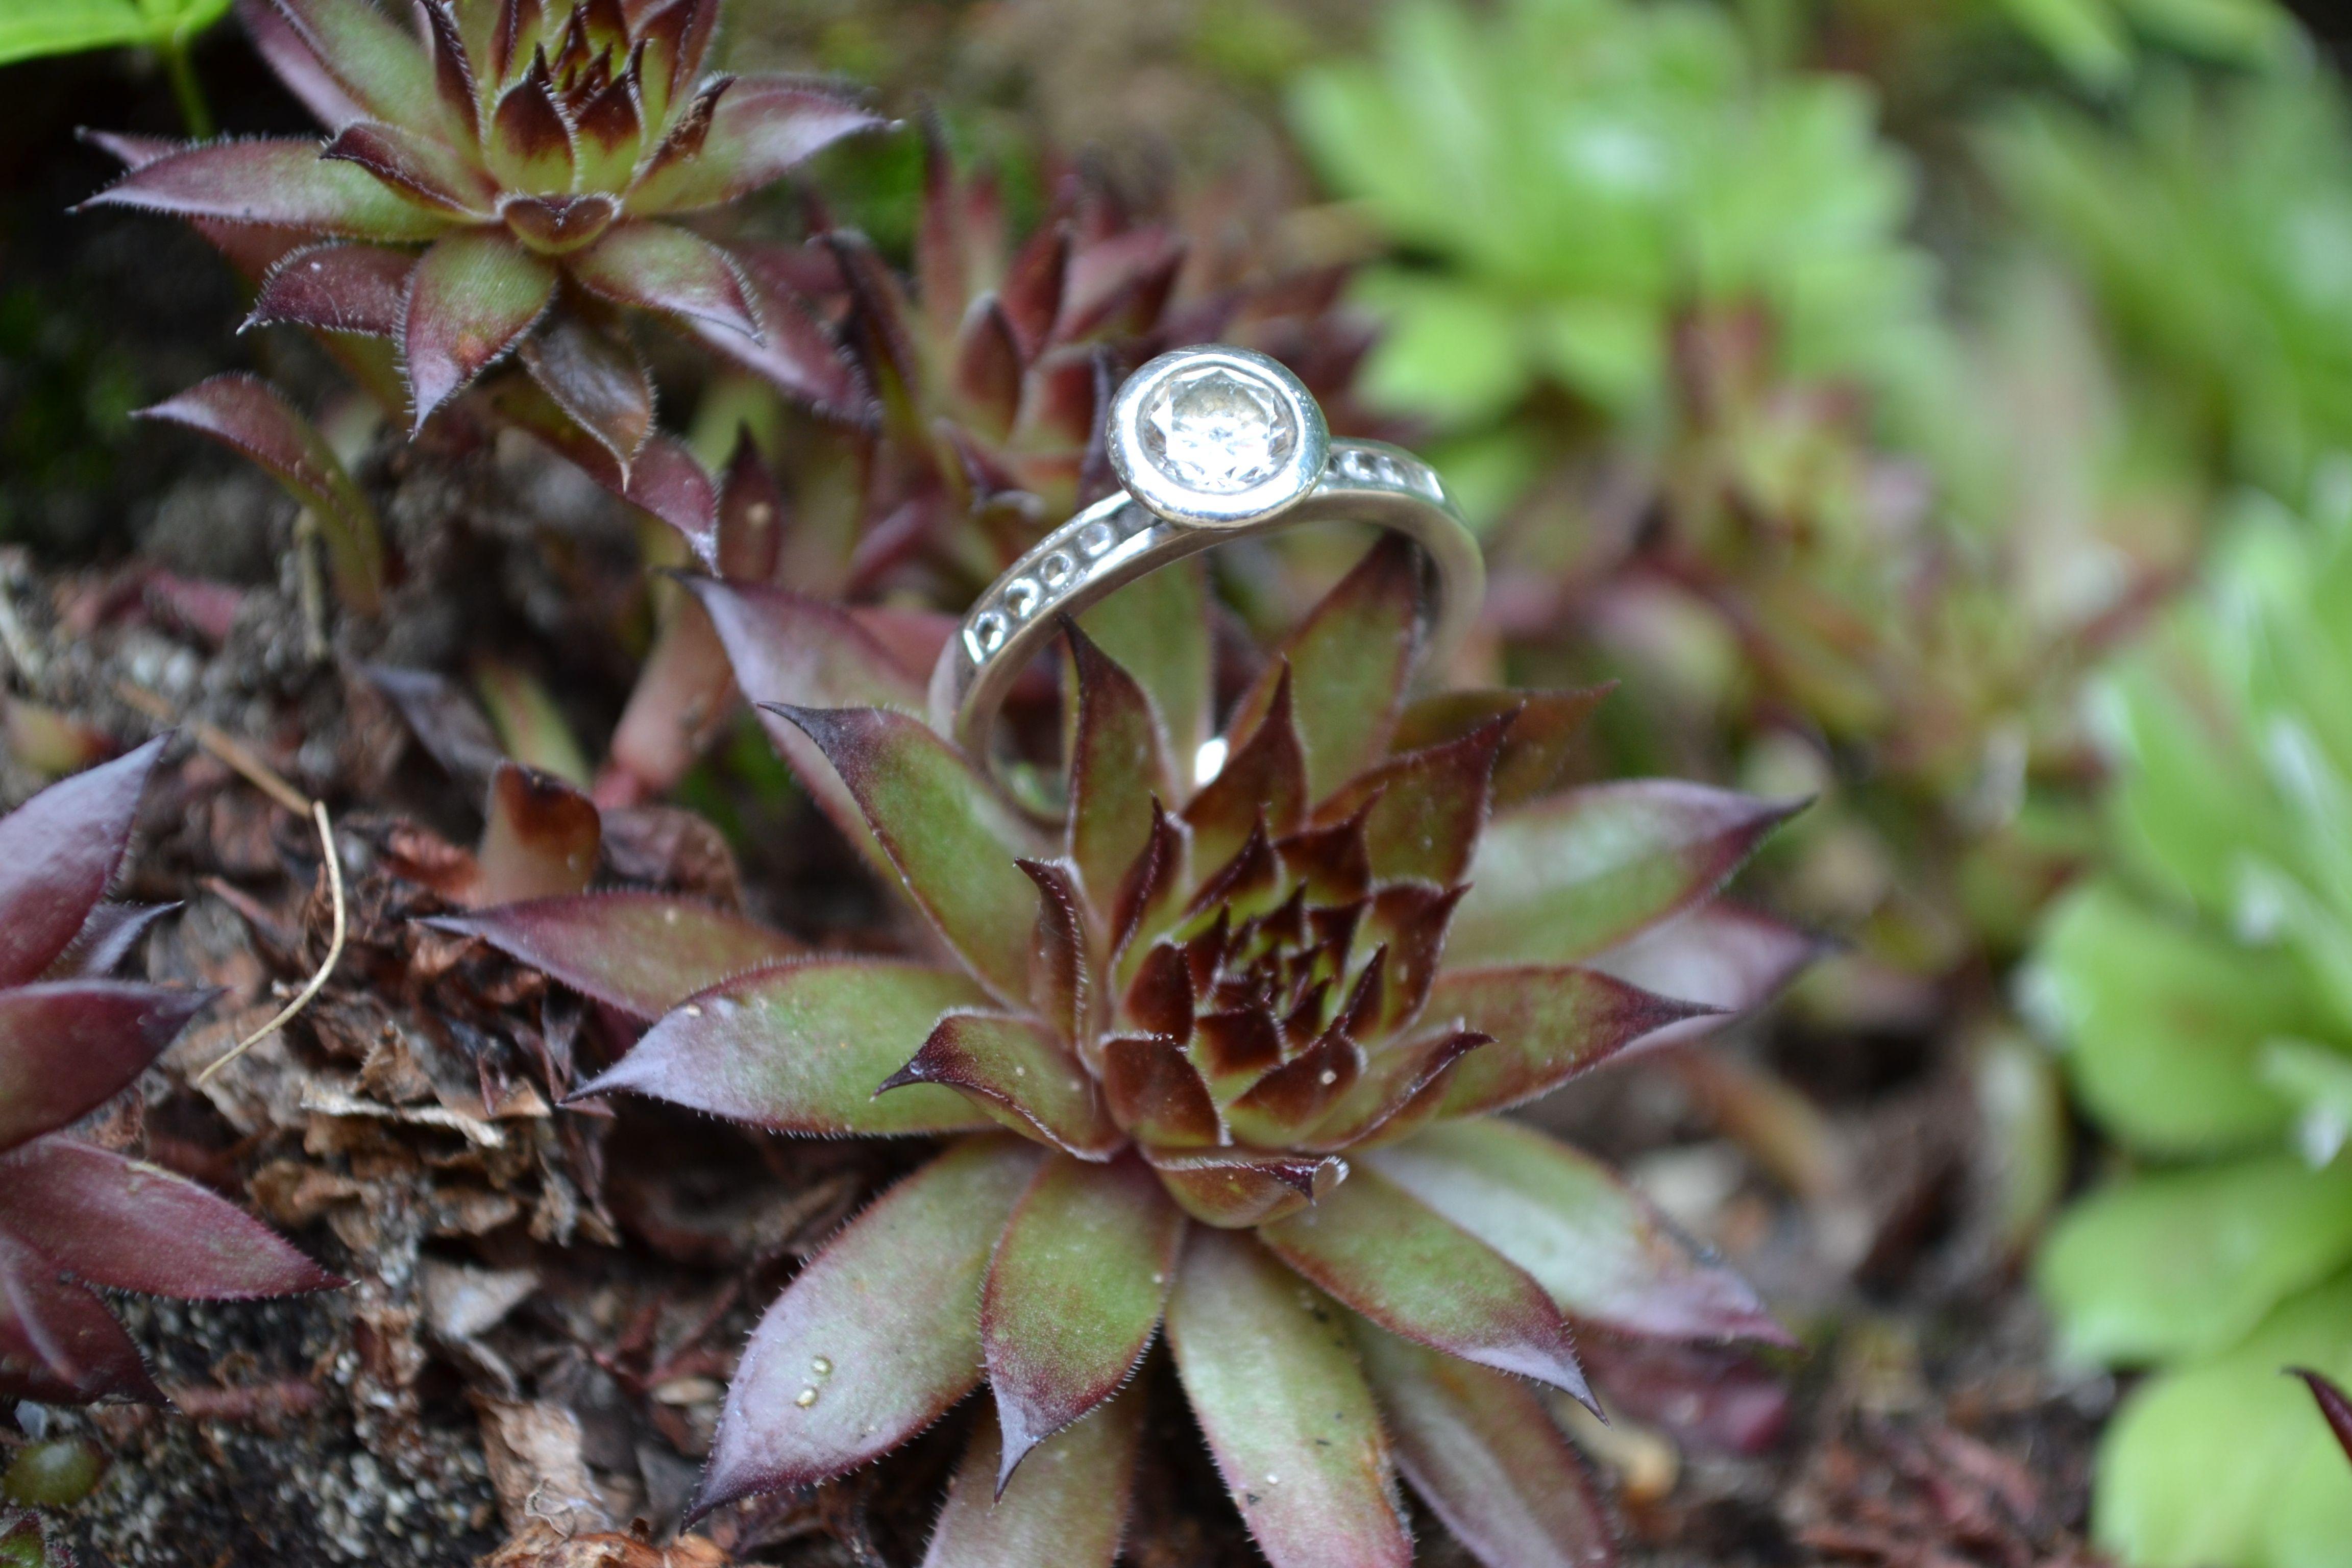 Jewelery photography